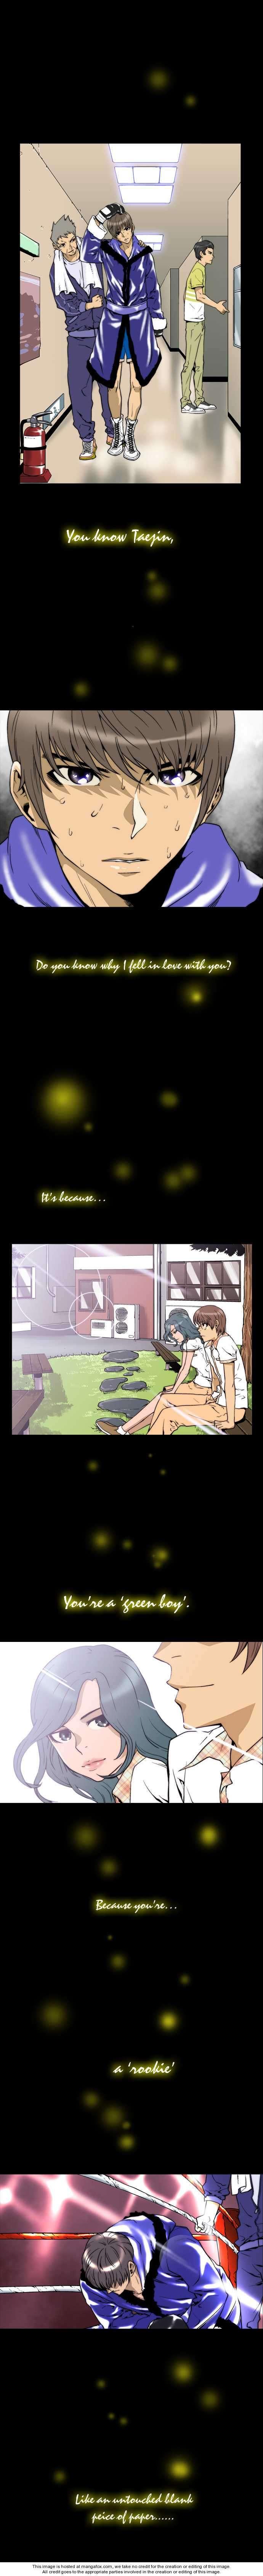 Green Boy 1 Page 1